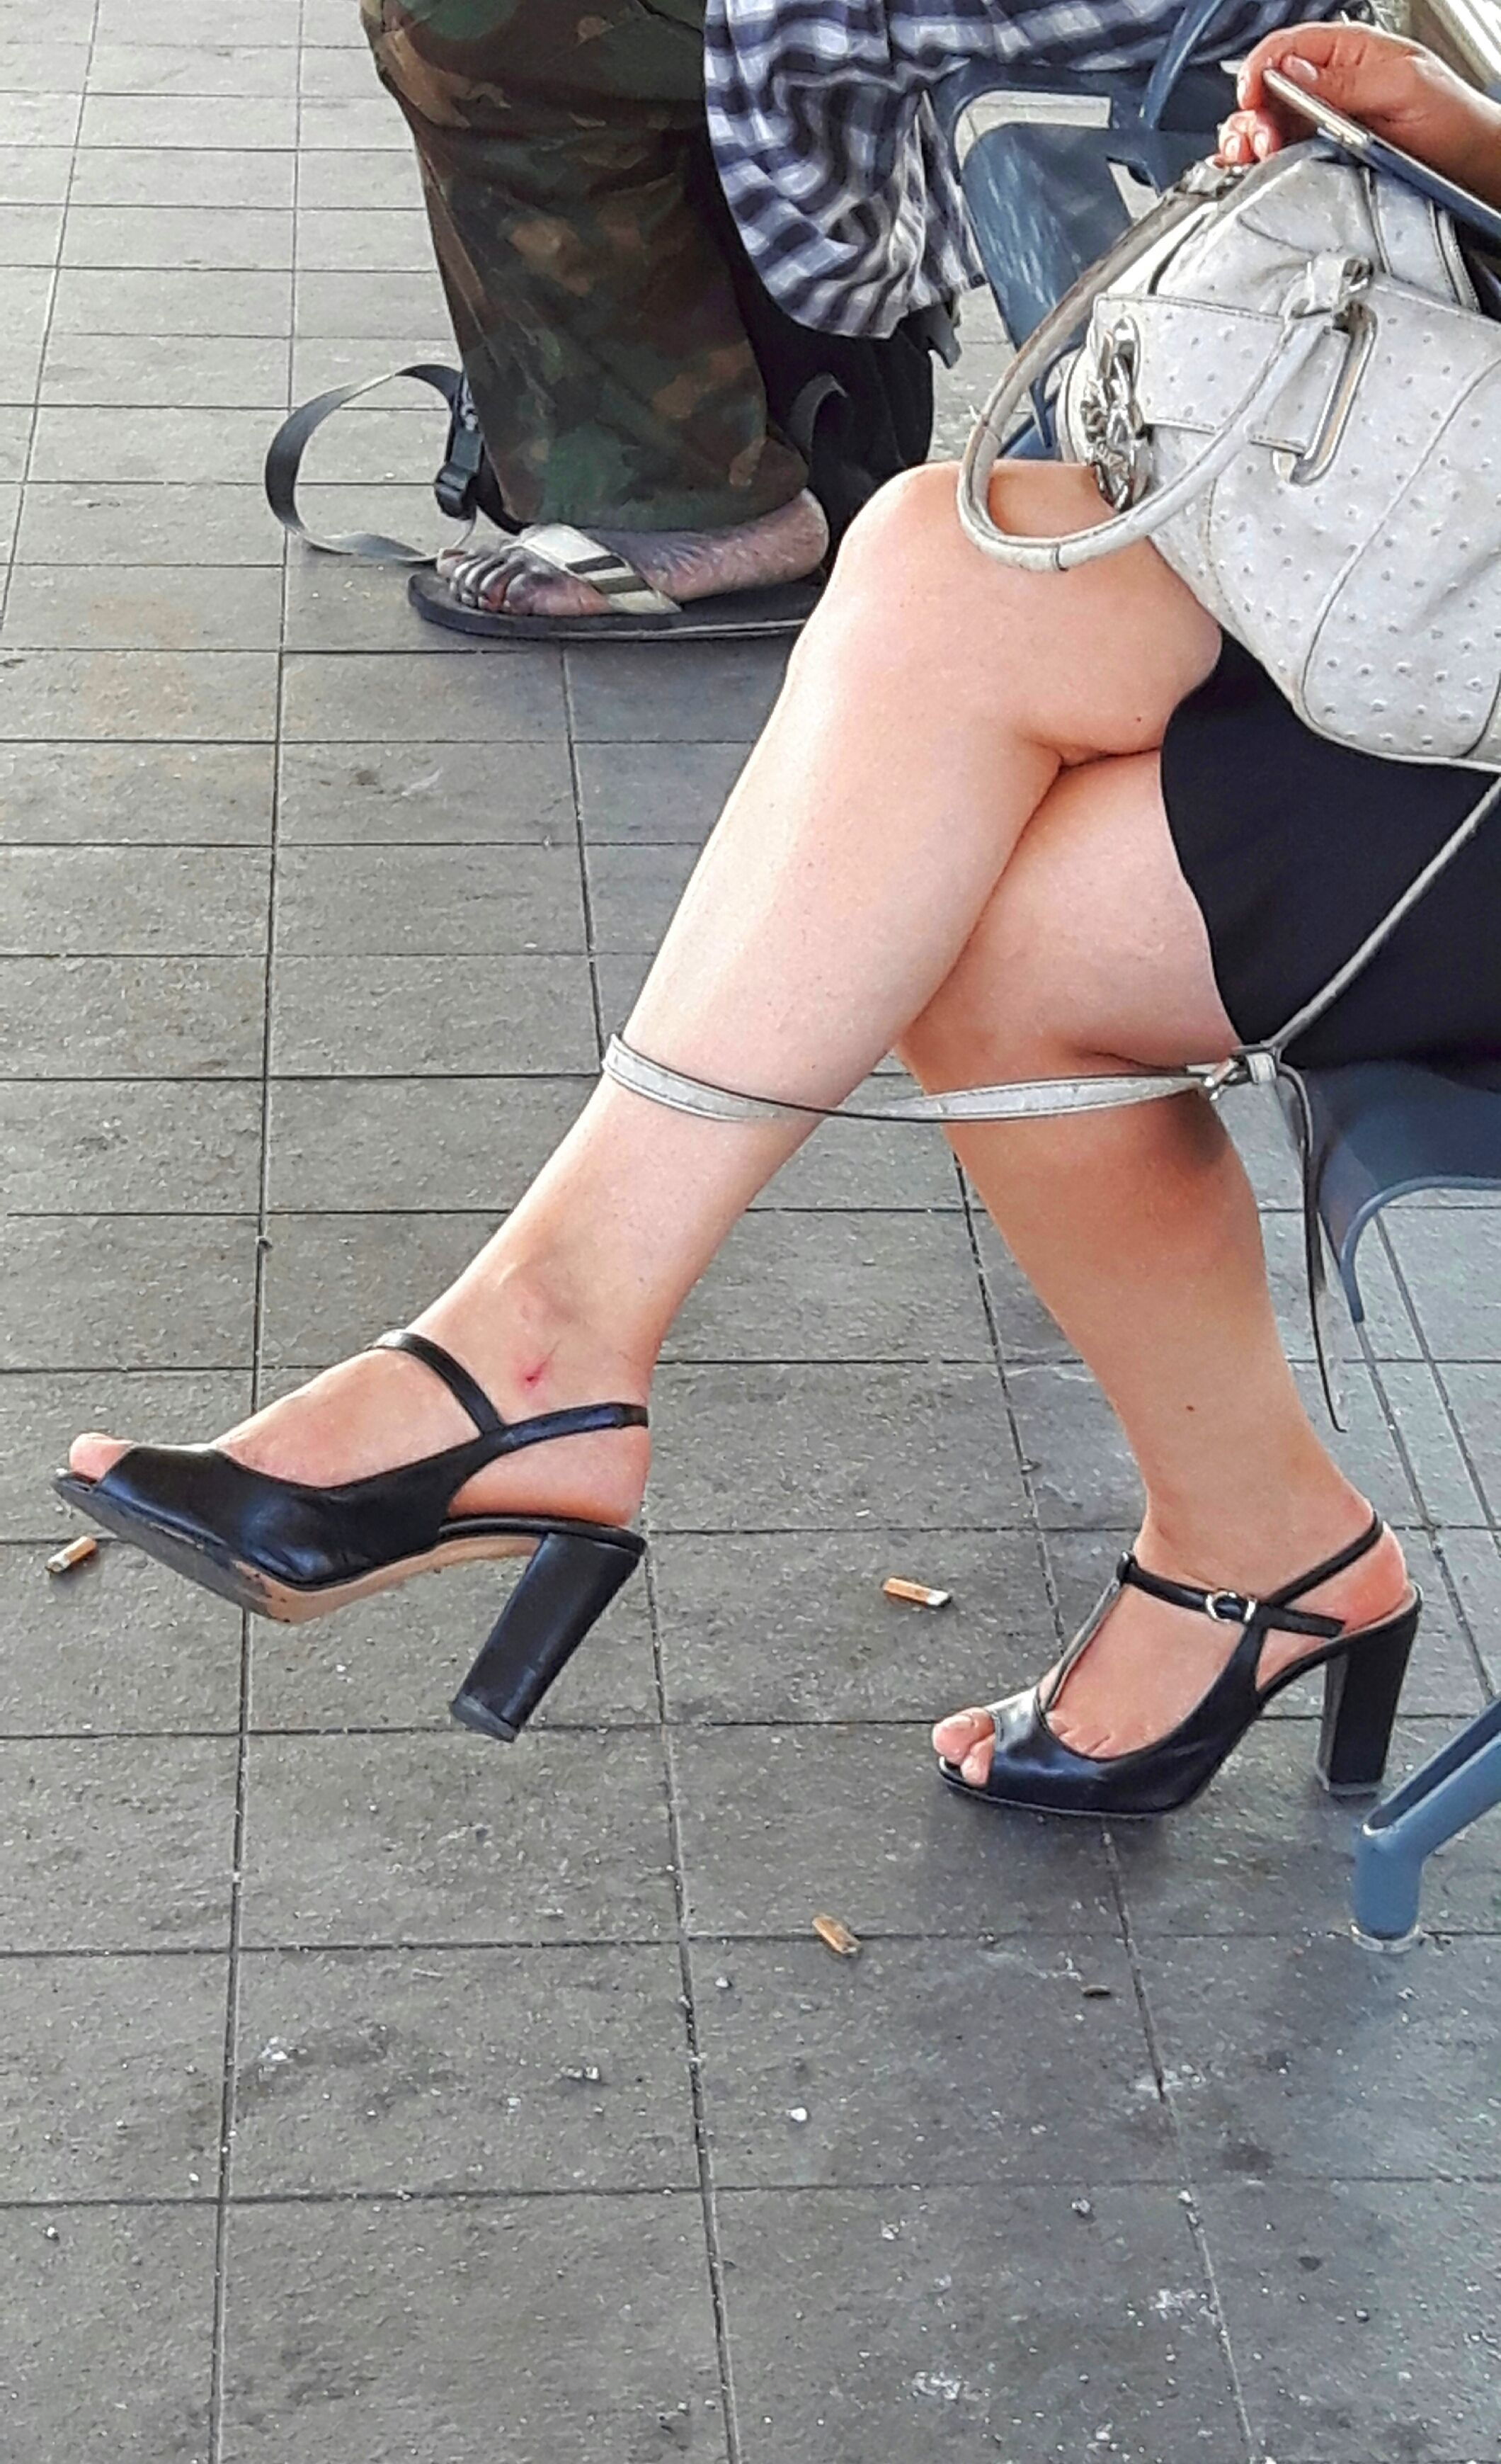 Candid crossed legs